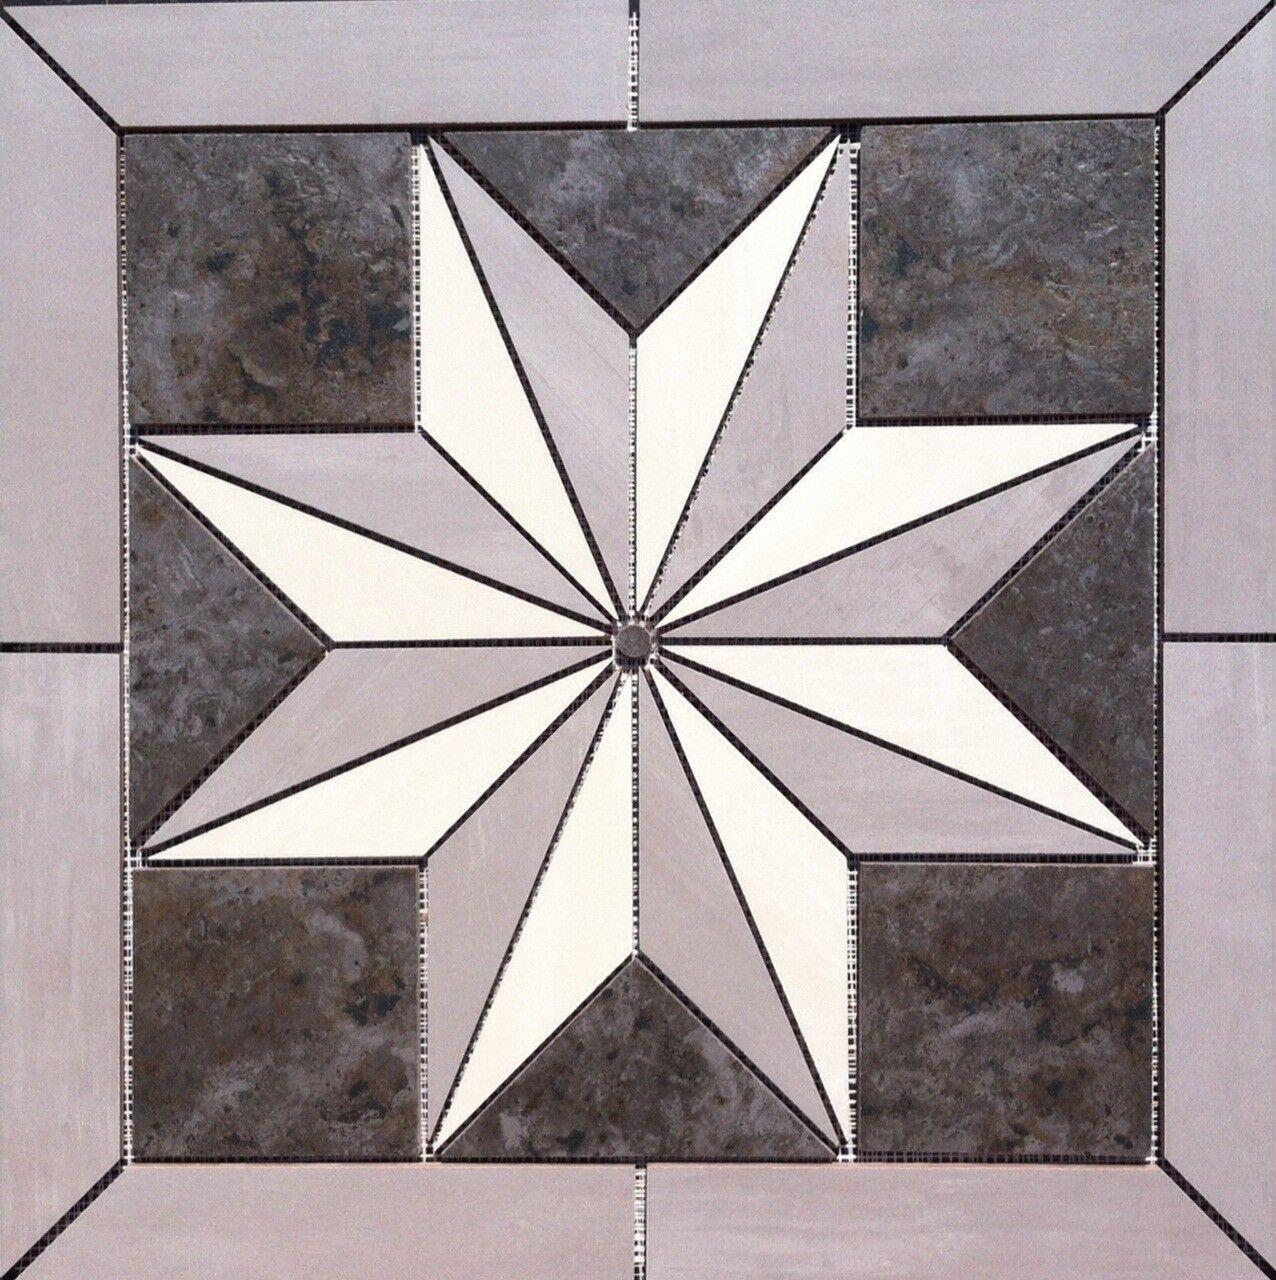 22 1 4  X 22 1 4  Tile Medallion - Daltile's Skybridge & Heathland tile series